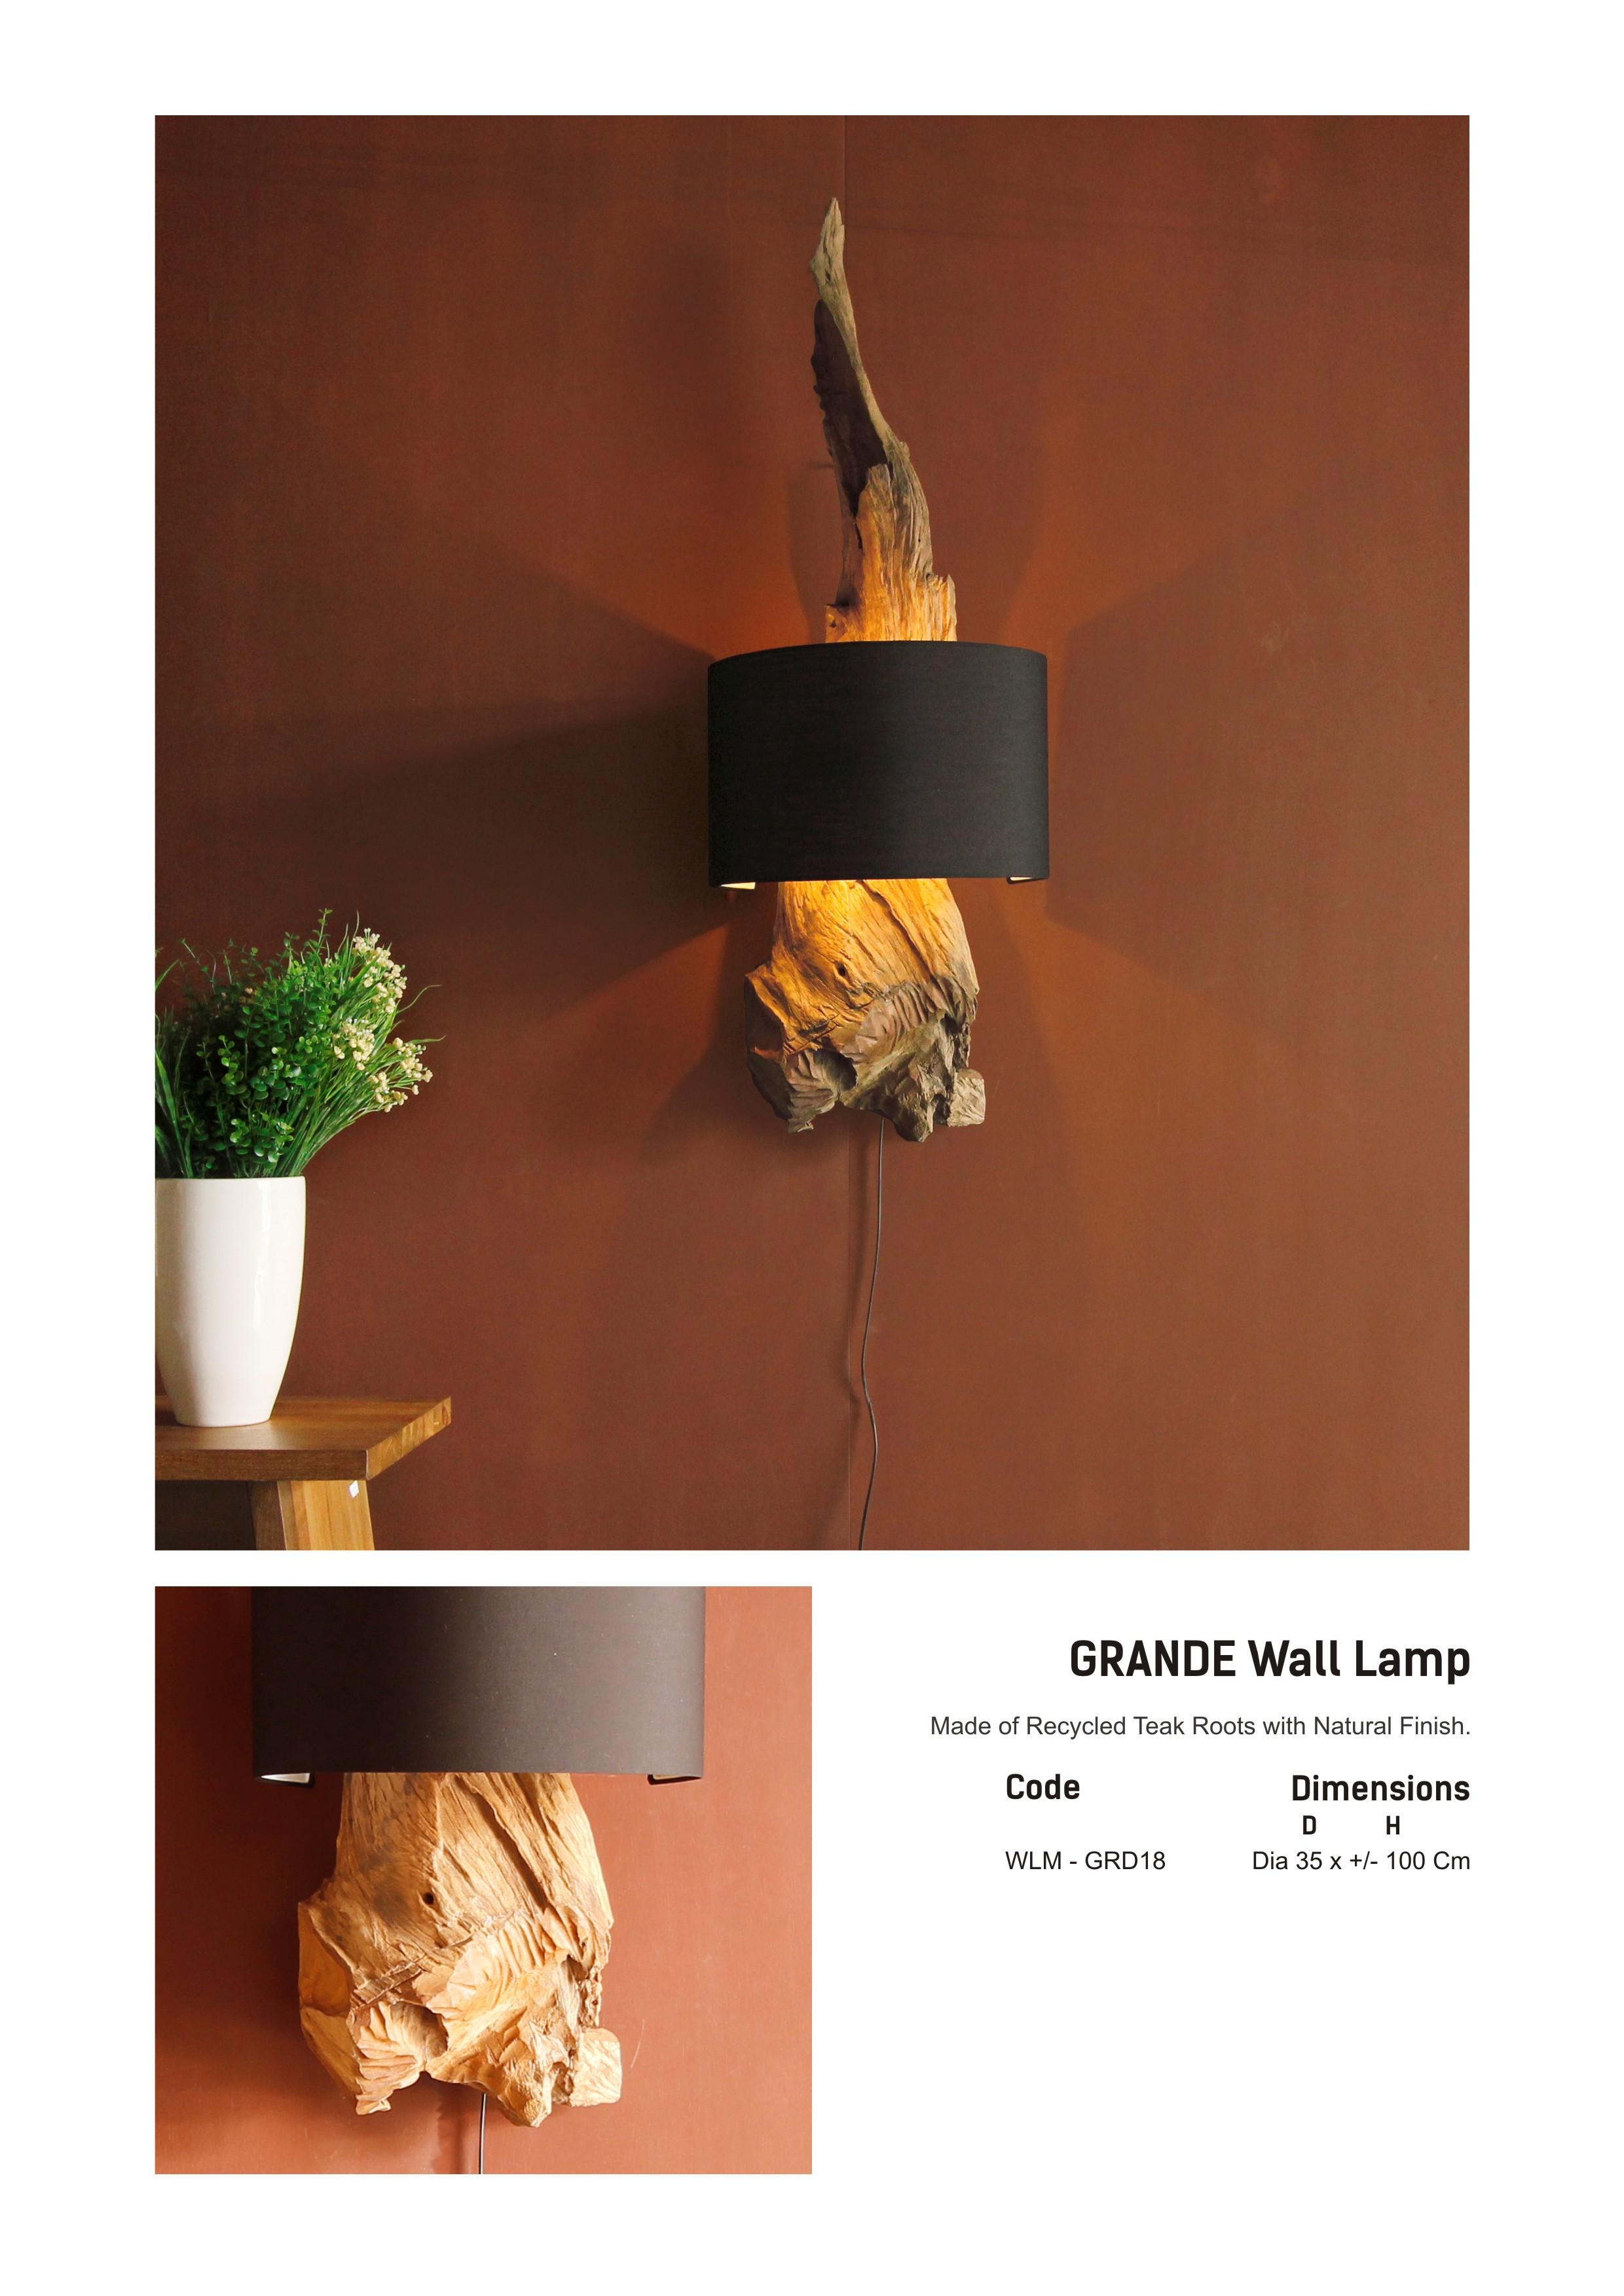 18. GRANDE Wall Lamp